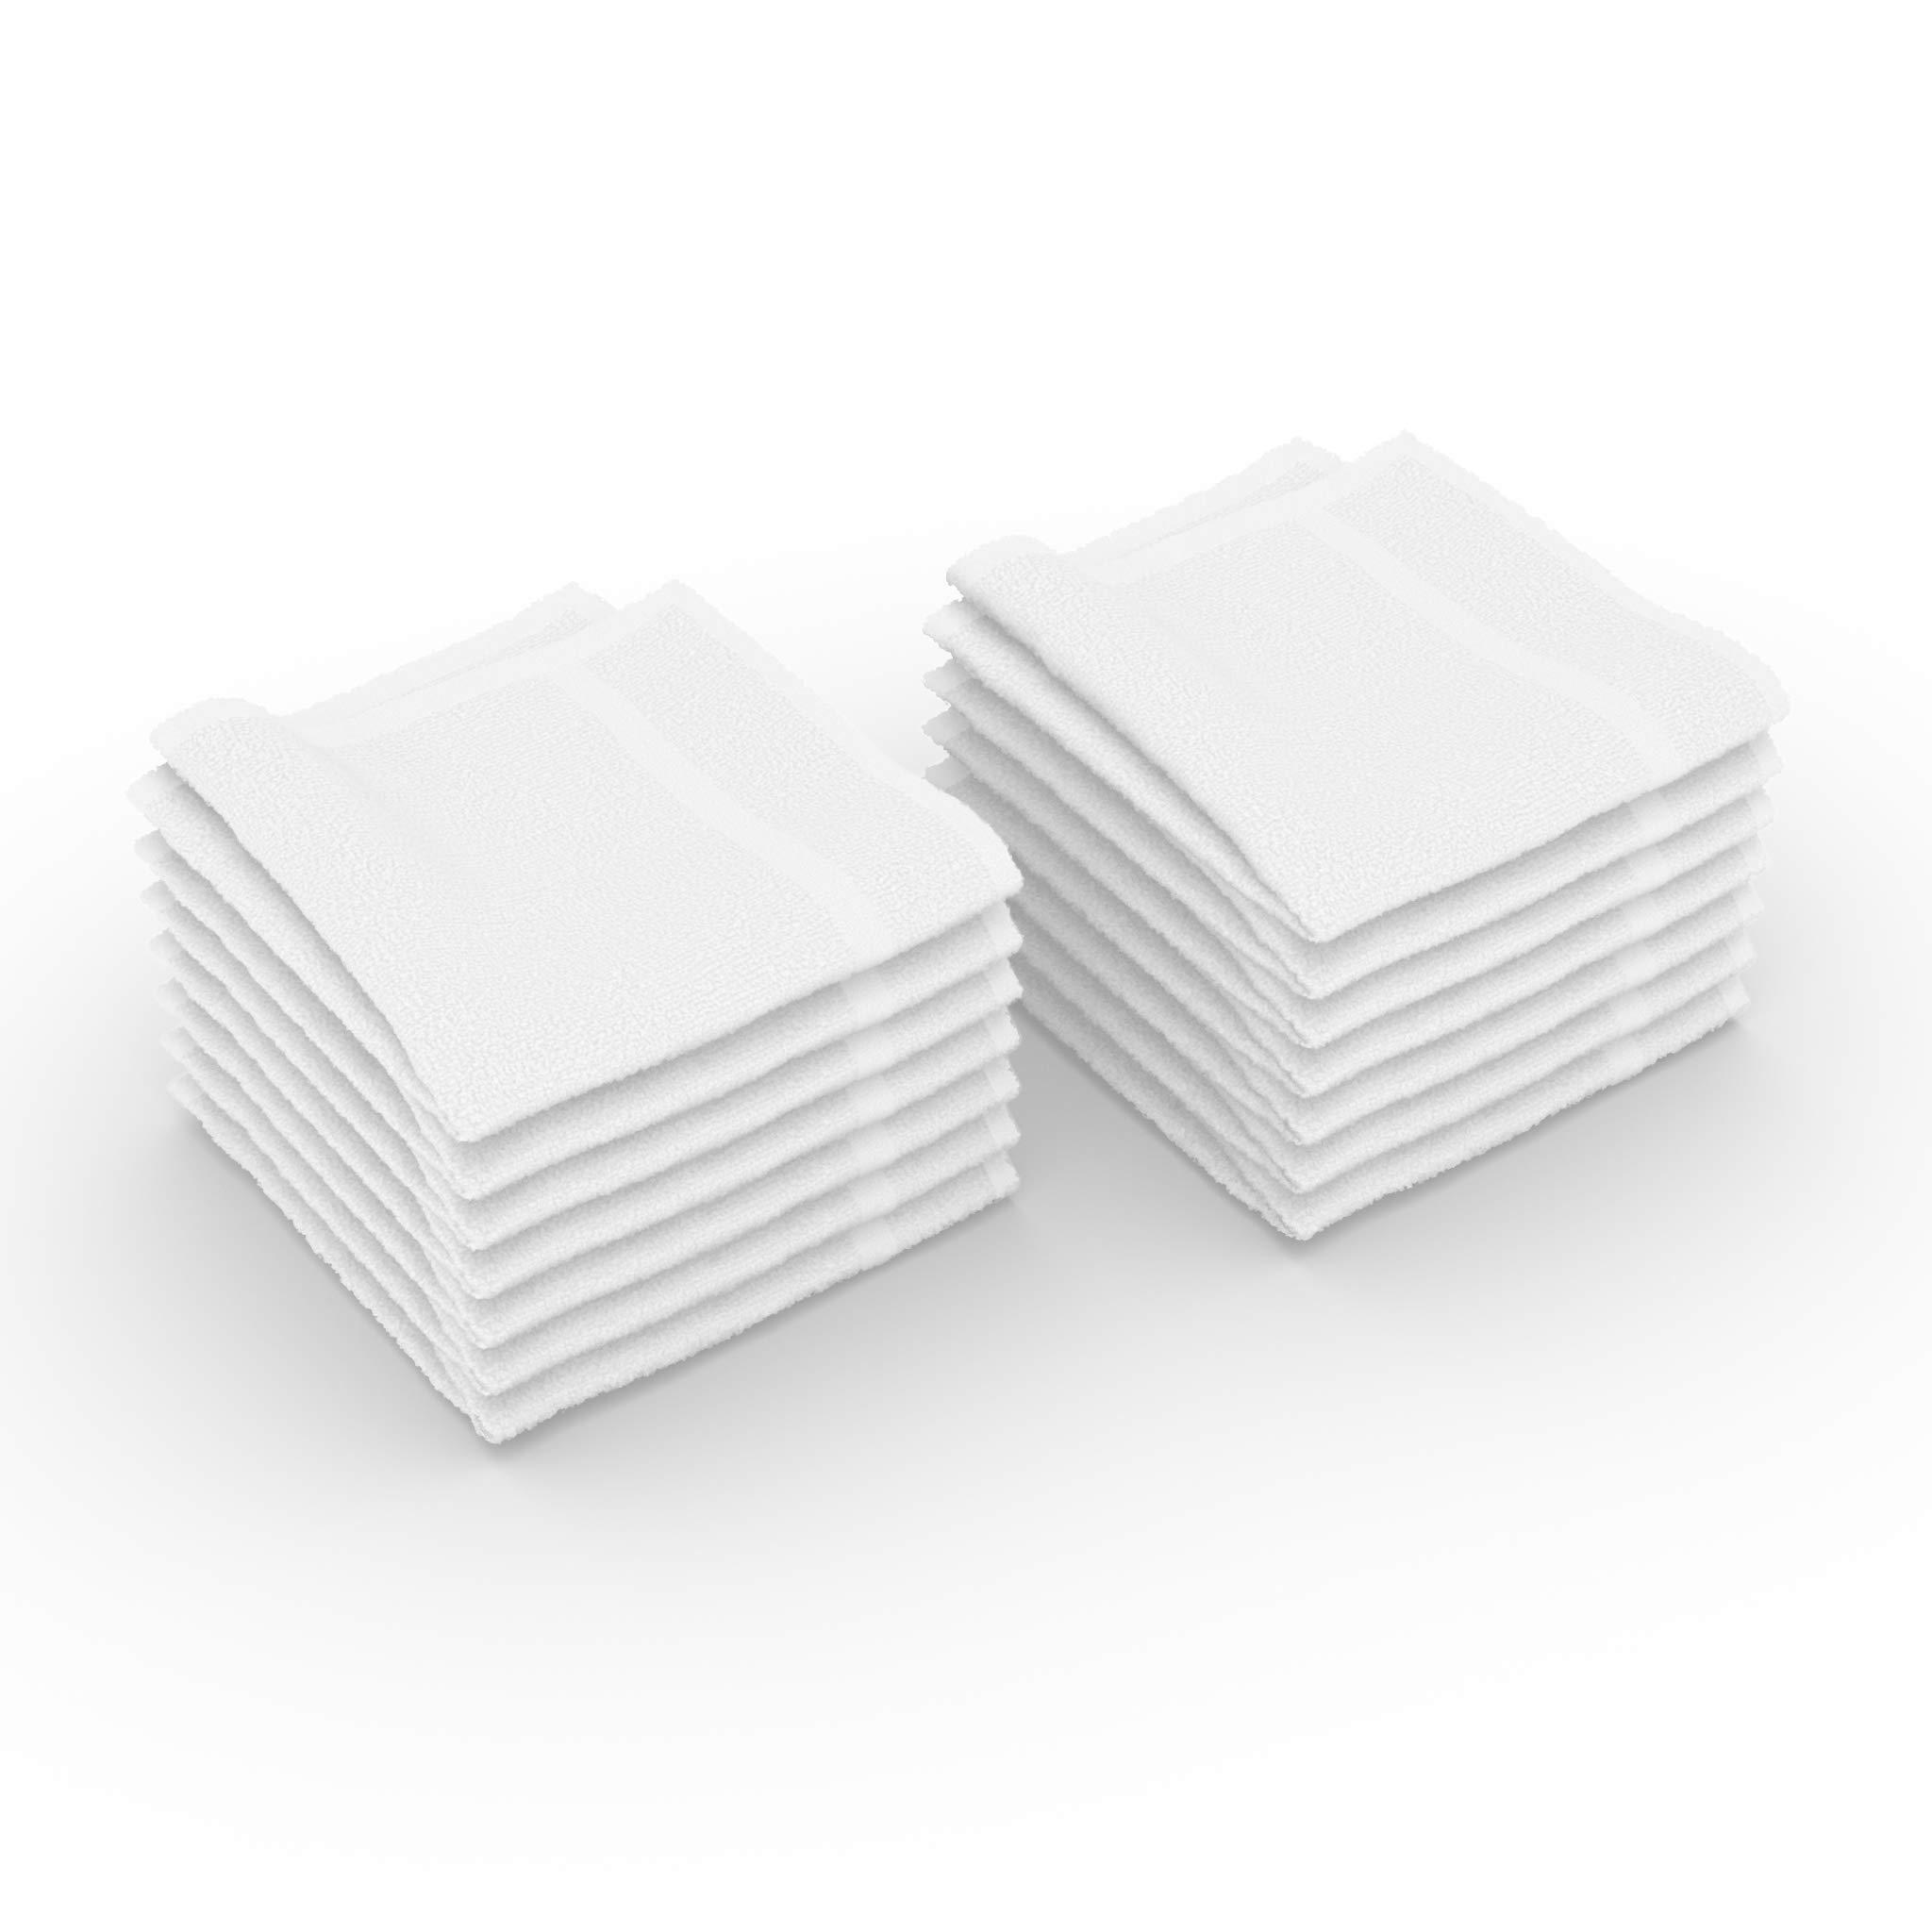 Jmr Premium White Cotton Washcloths 12x12 Soft Absorbent Face Towels,Bath,Spa,Gym Use (24 Pack)